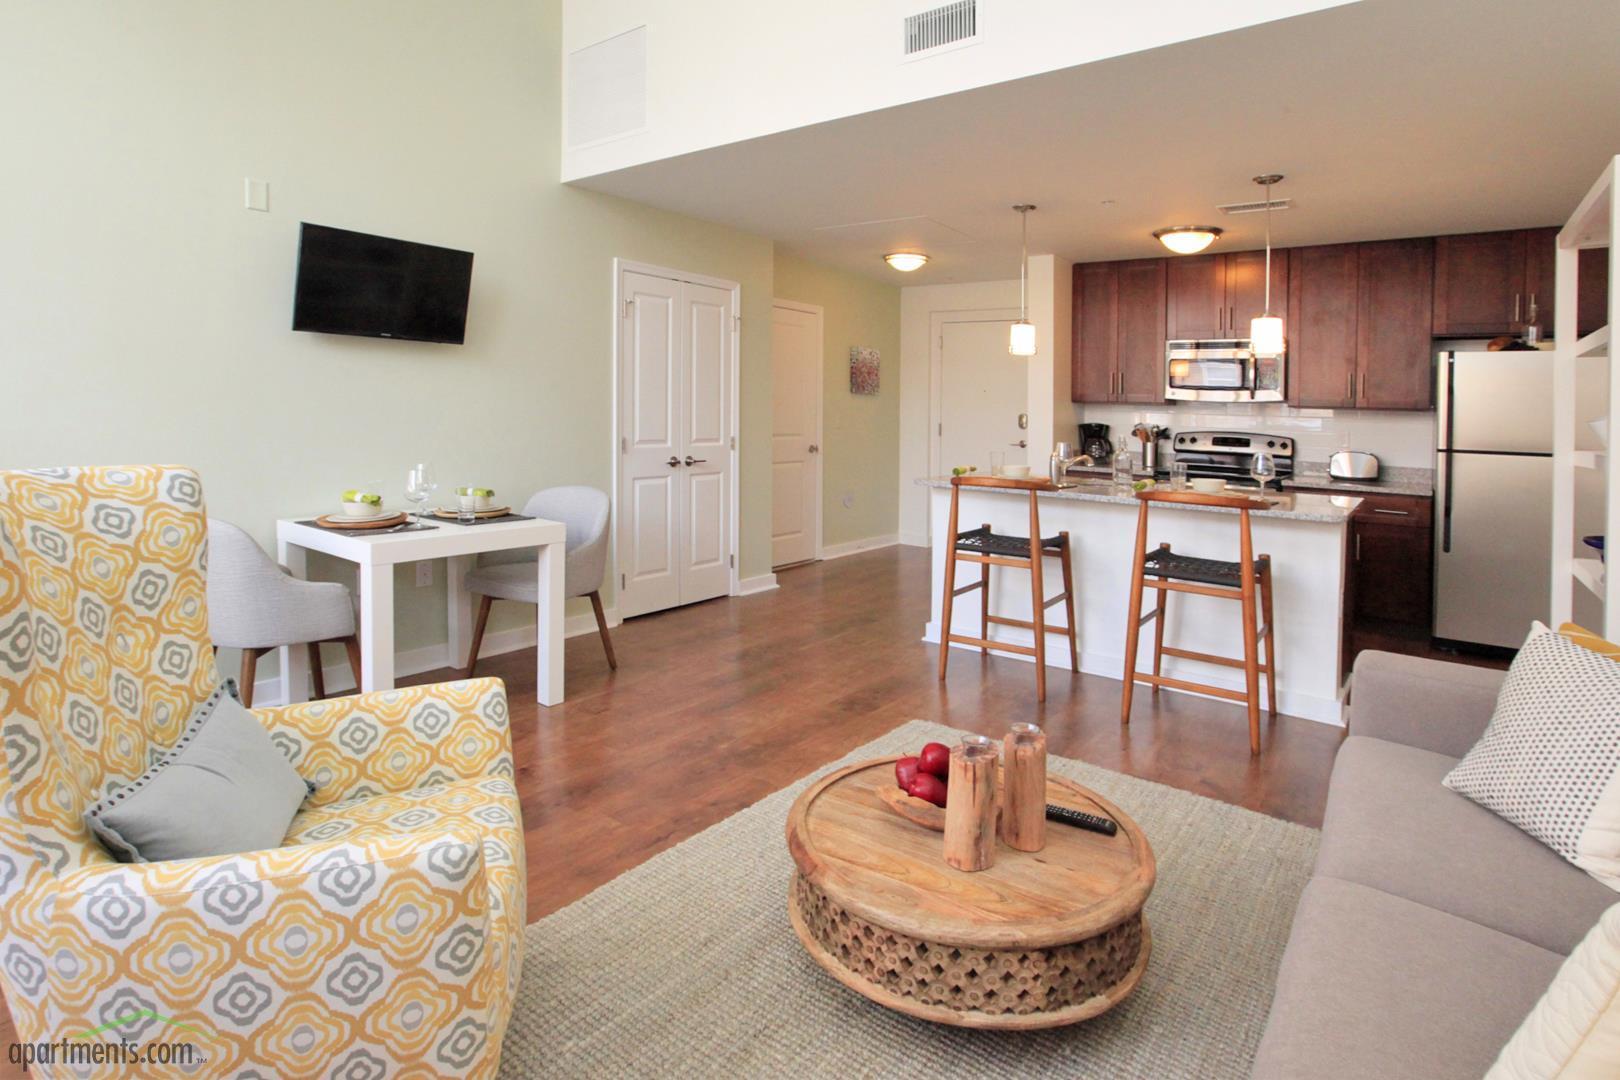 101 Ellwood Apartments, Baltimore MD - Walk Score